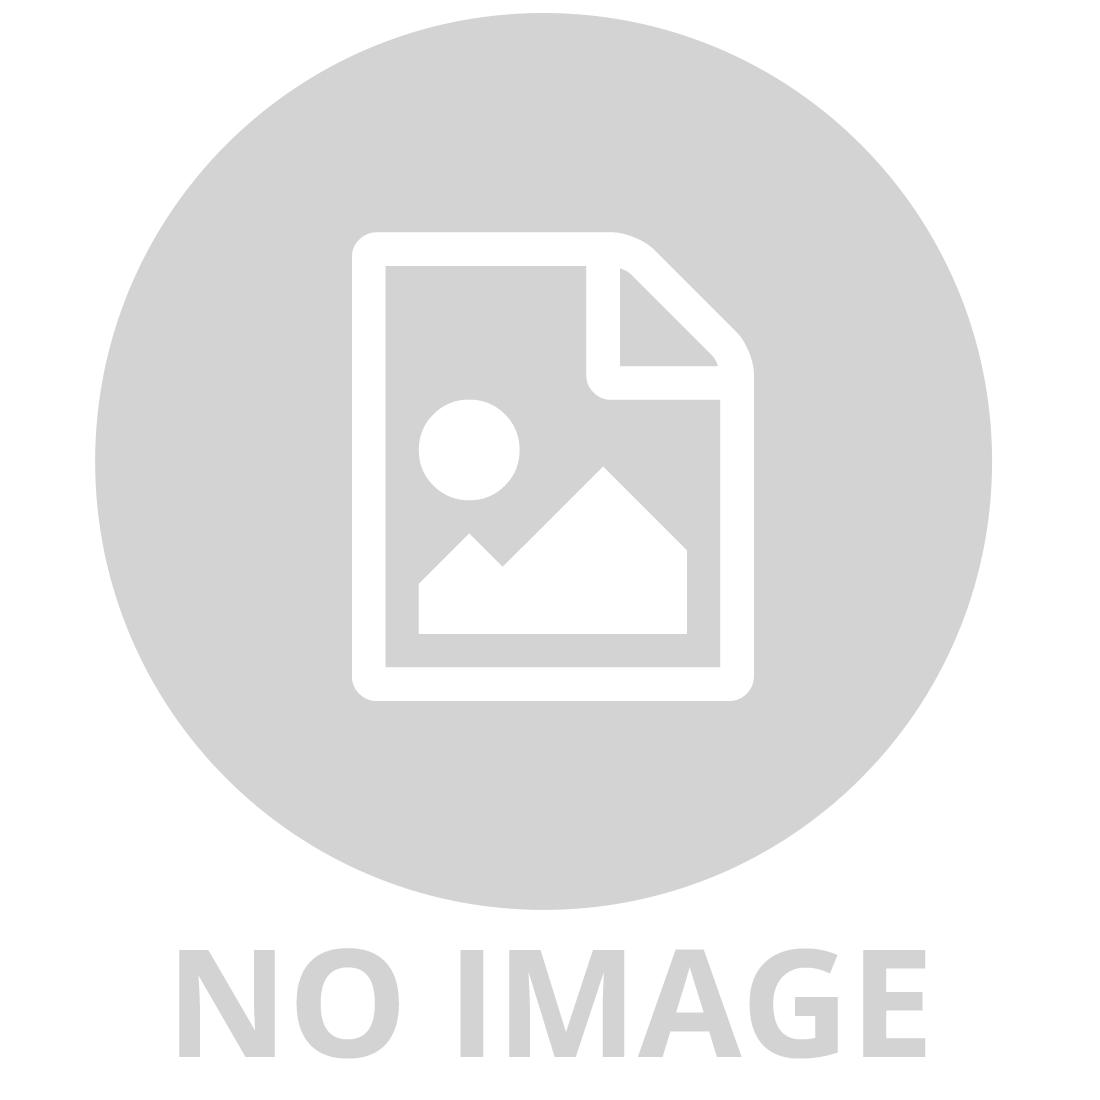 STAR WARS X-WING STARFIGHTER RADIO CONTROL